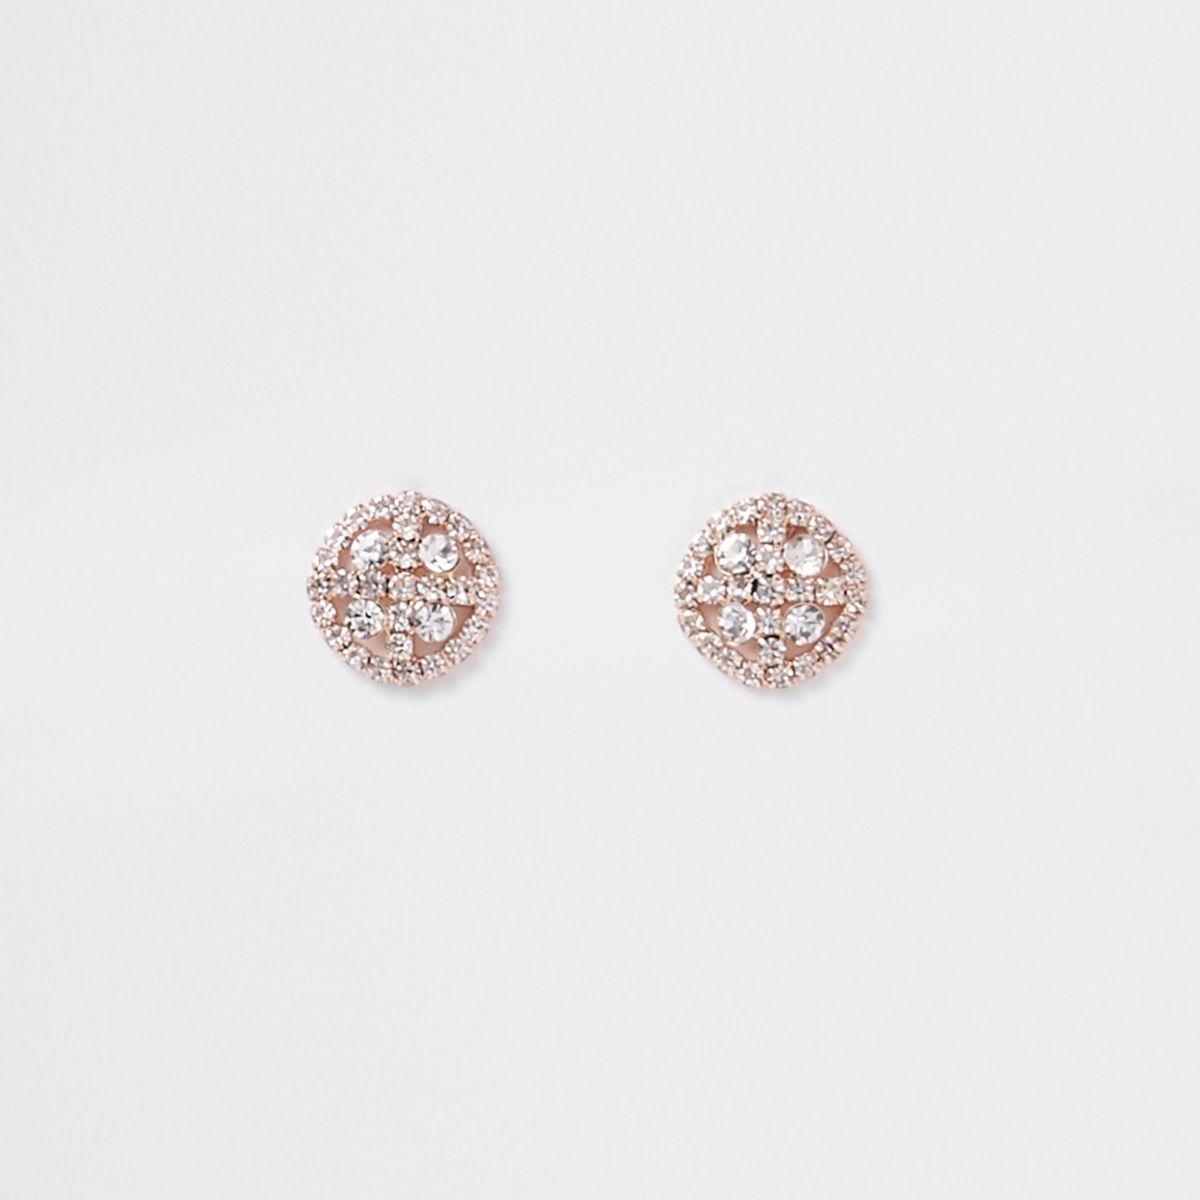 Rose gold tone circle rhinestone stud earrings